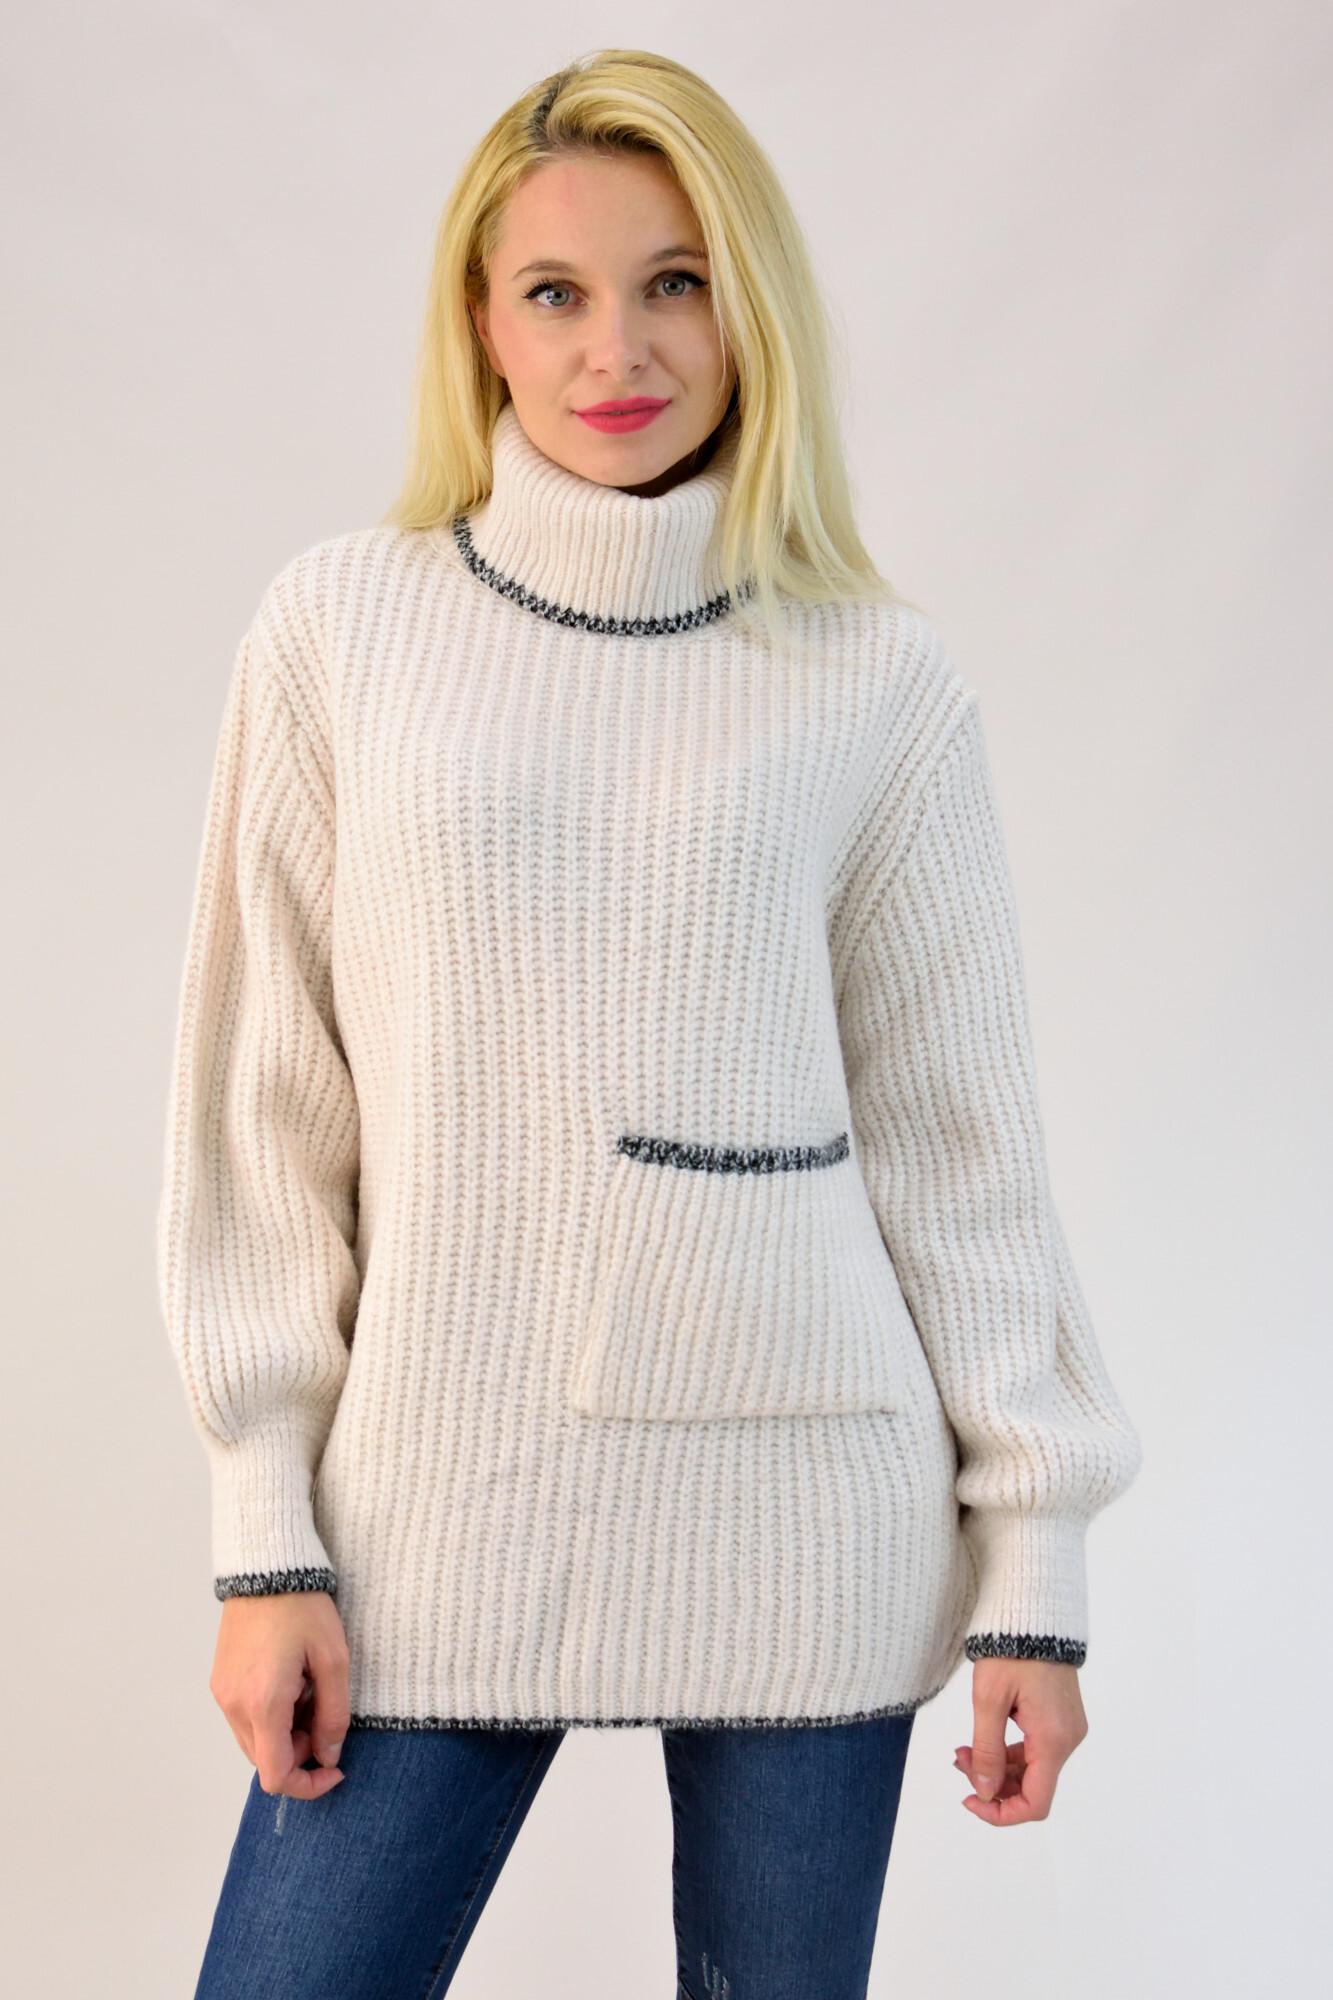 498160a556e7 Πλεκτό πουλόβερ oversized με τσέπη. Tap to expand